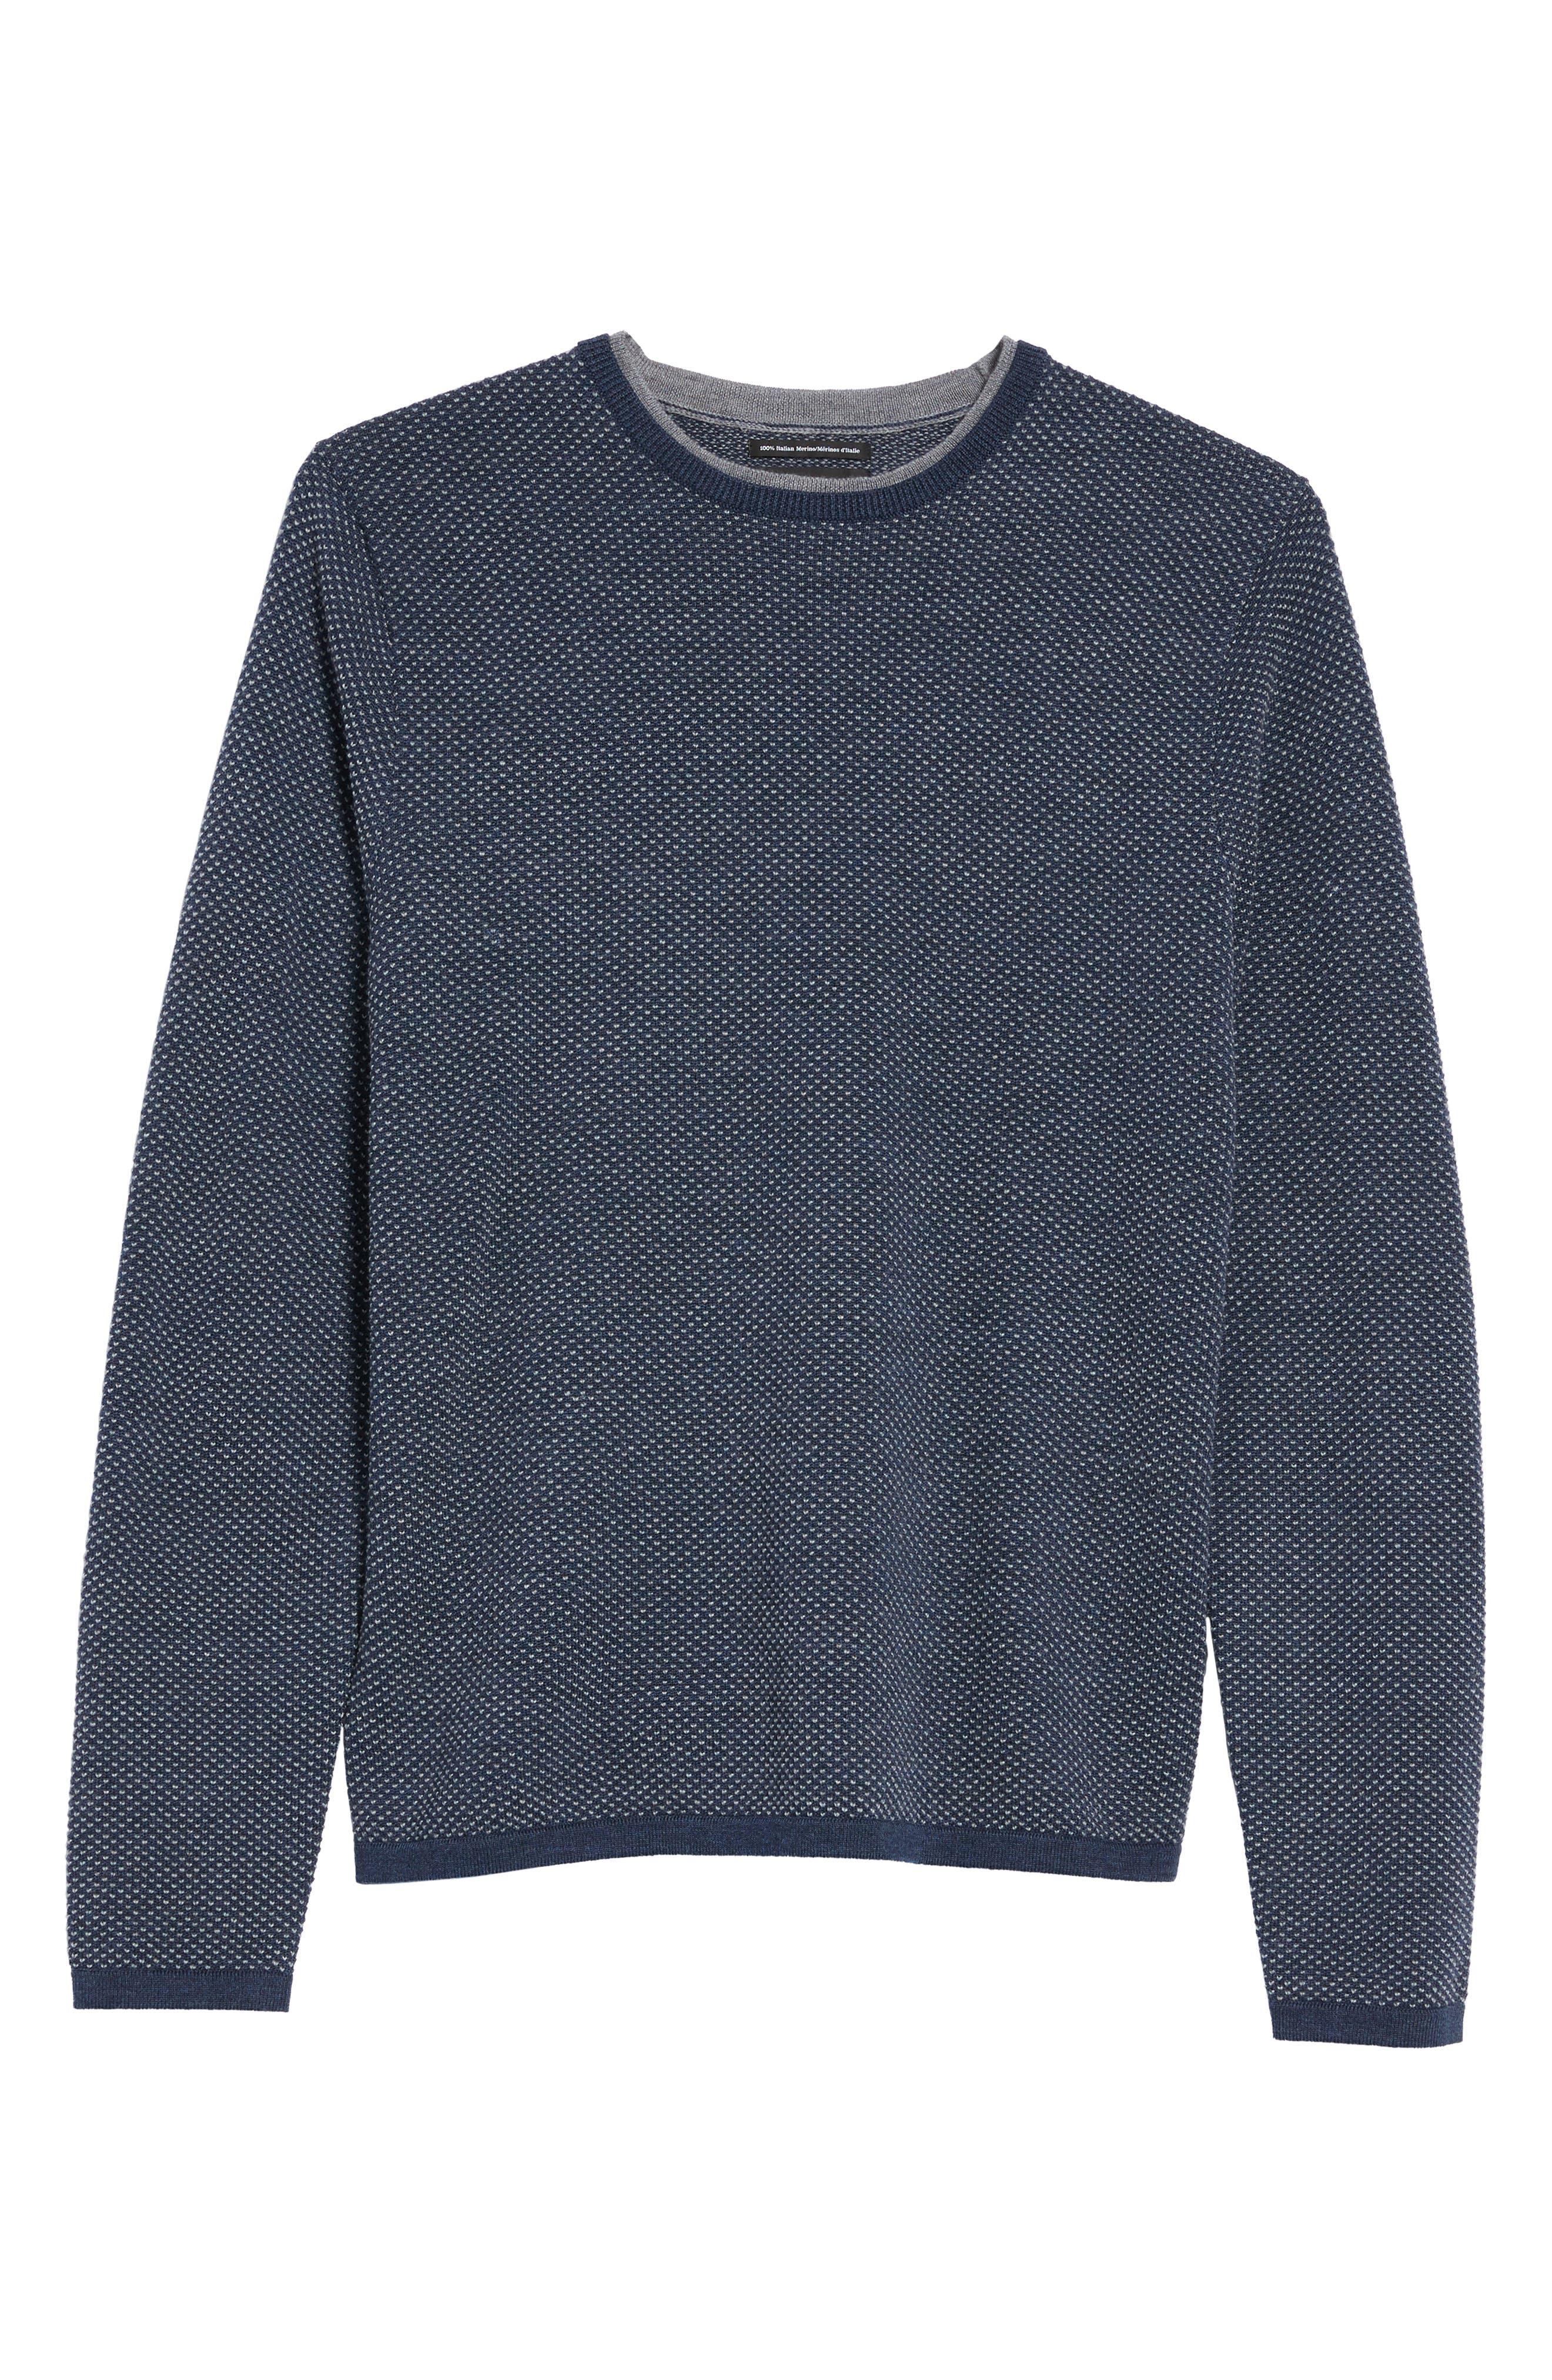 Textured Merino Wool Sweater,                             Alternate thumbnail 6, color,                             410